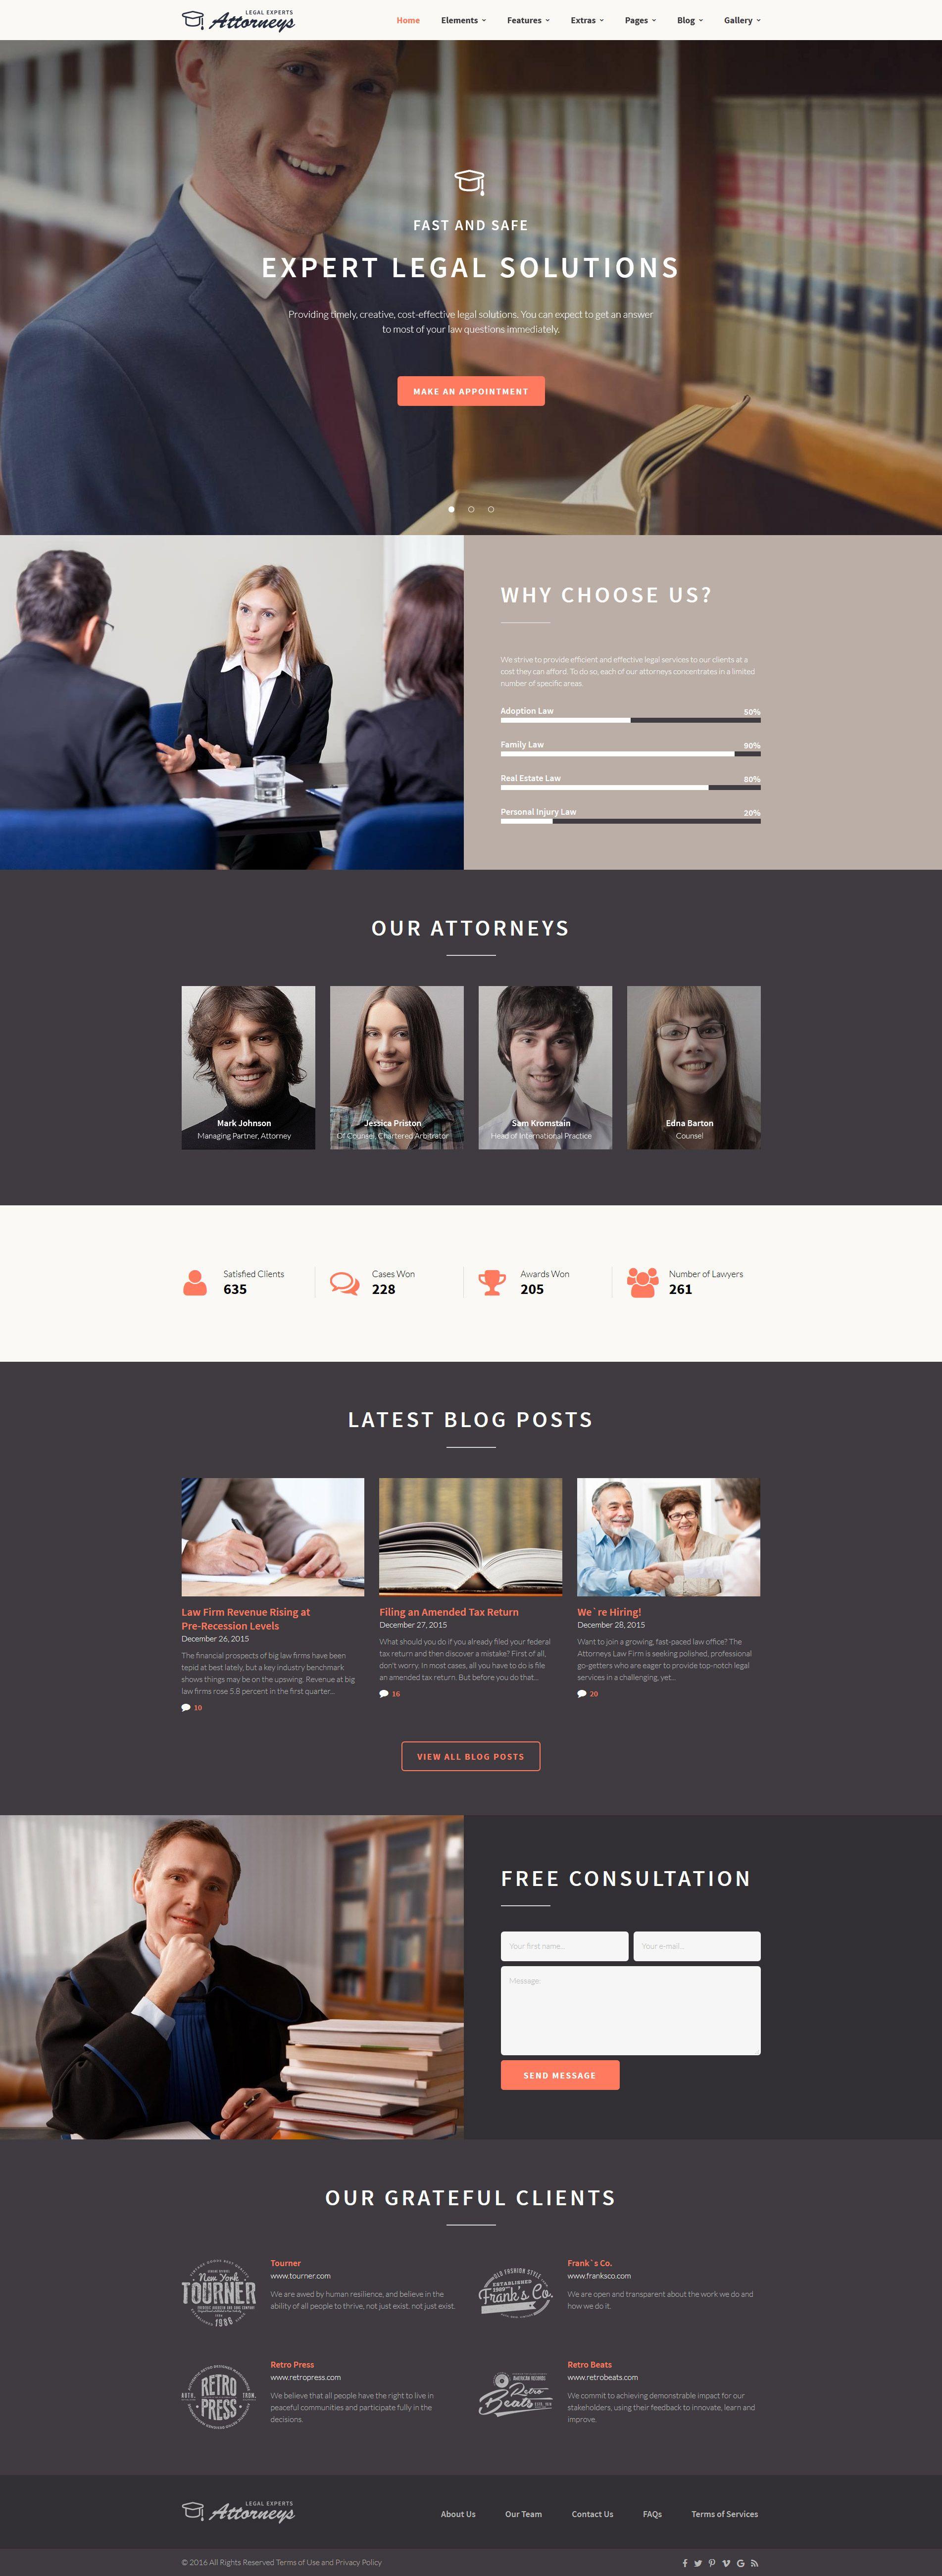 Law Firm Responsive Website Template | Pinterest | Template, Website ...